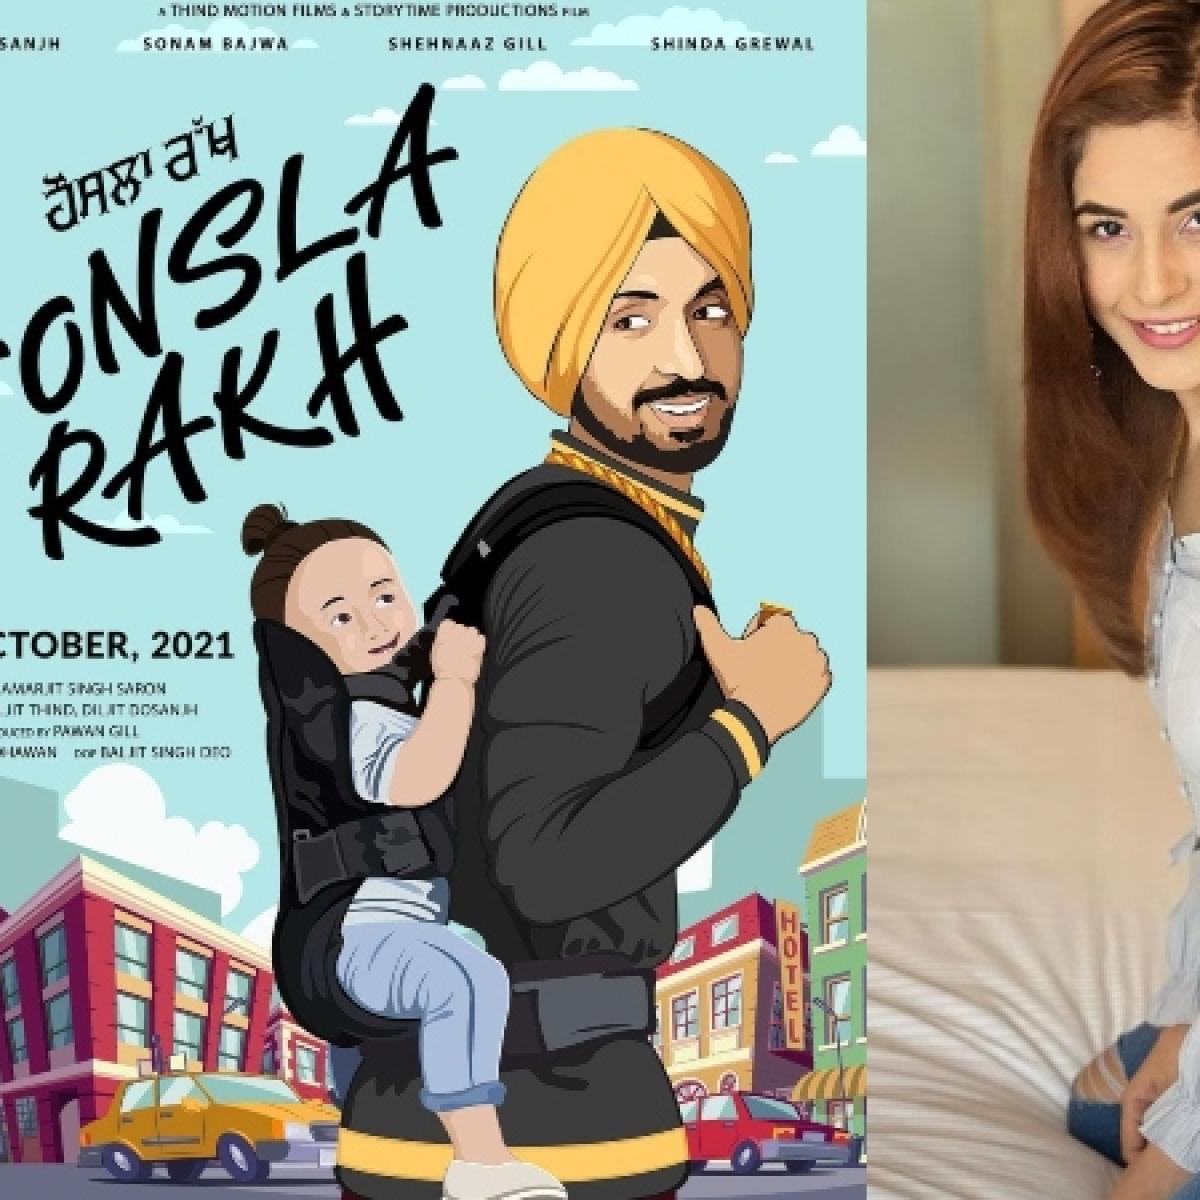 Diljit Dosanjh to star in and produce 'Honsla Rakh' featuring Shehnaaz Gill'